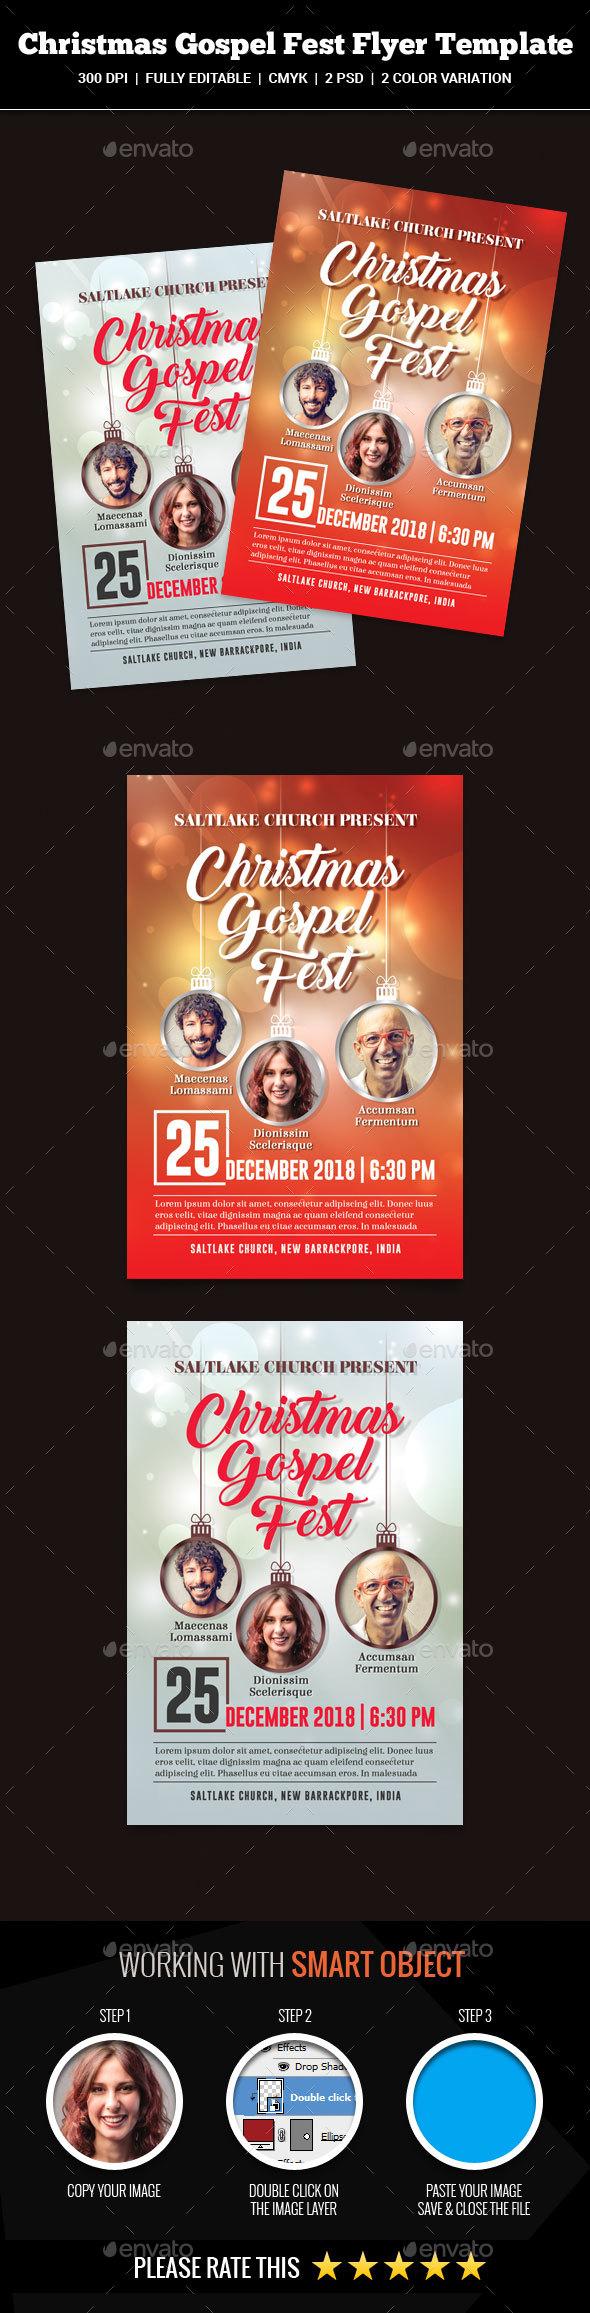 Christmas Gospel Fest Flyer - Church Flyers